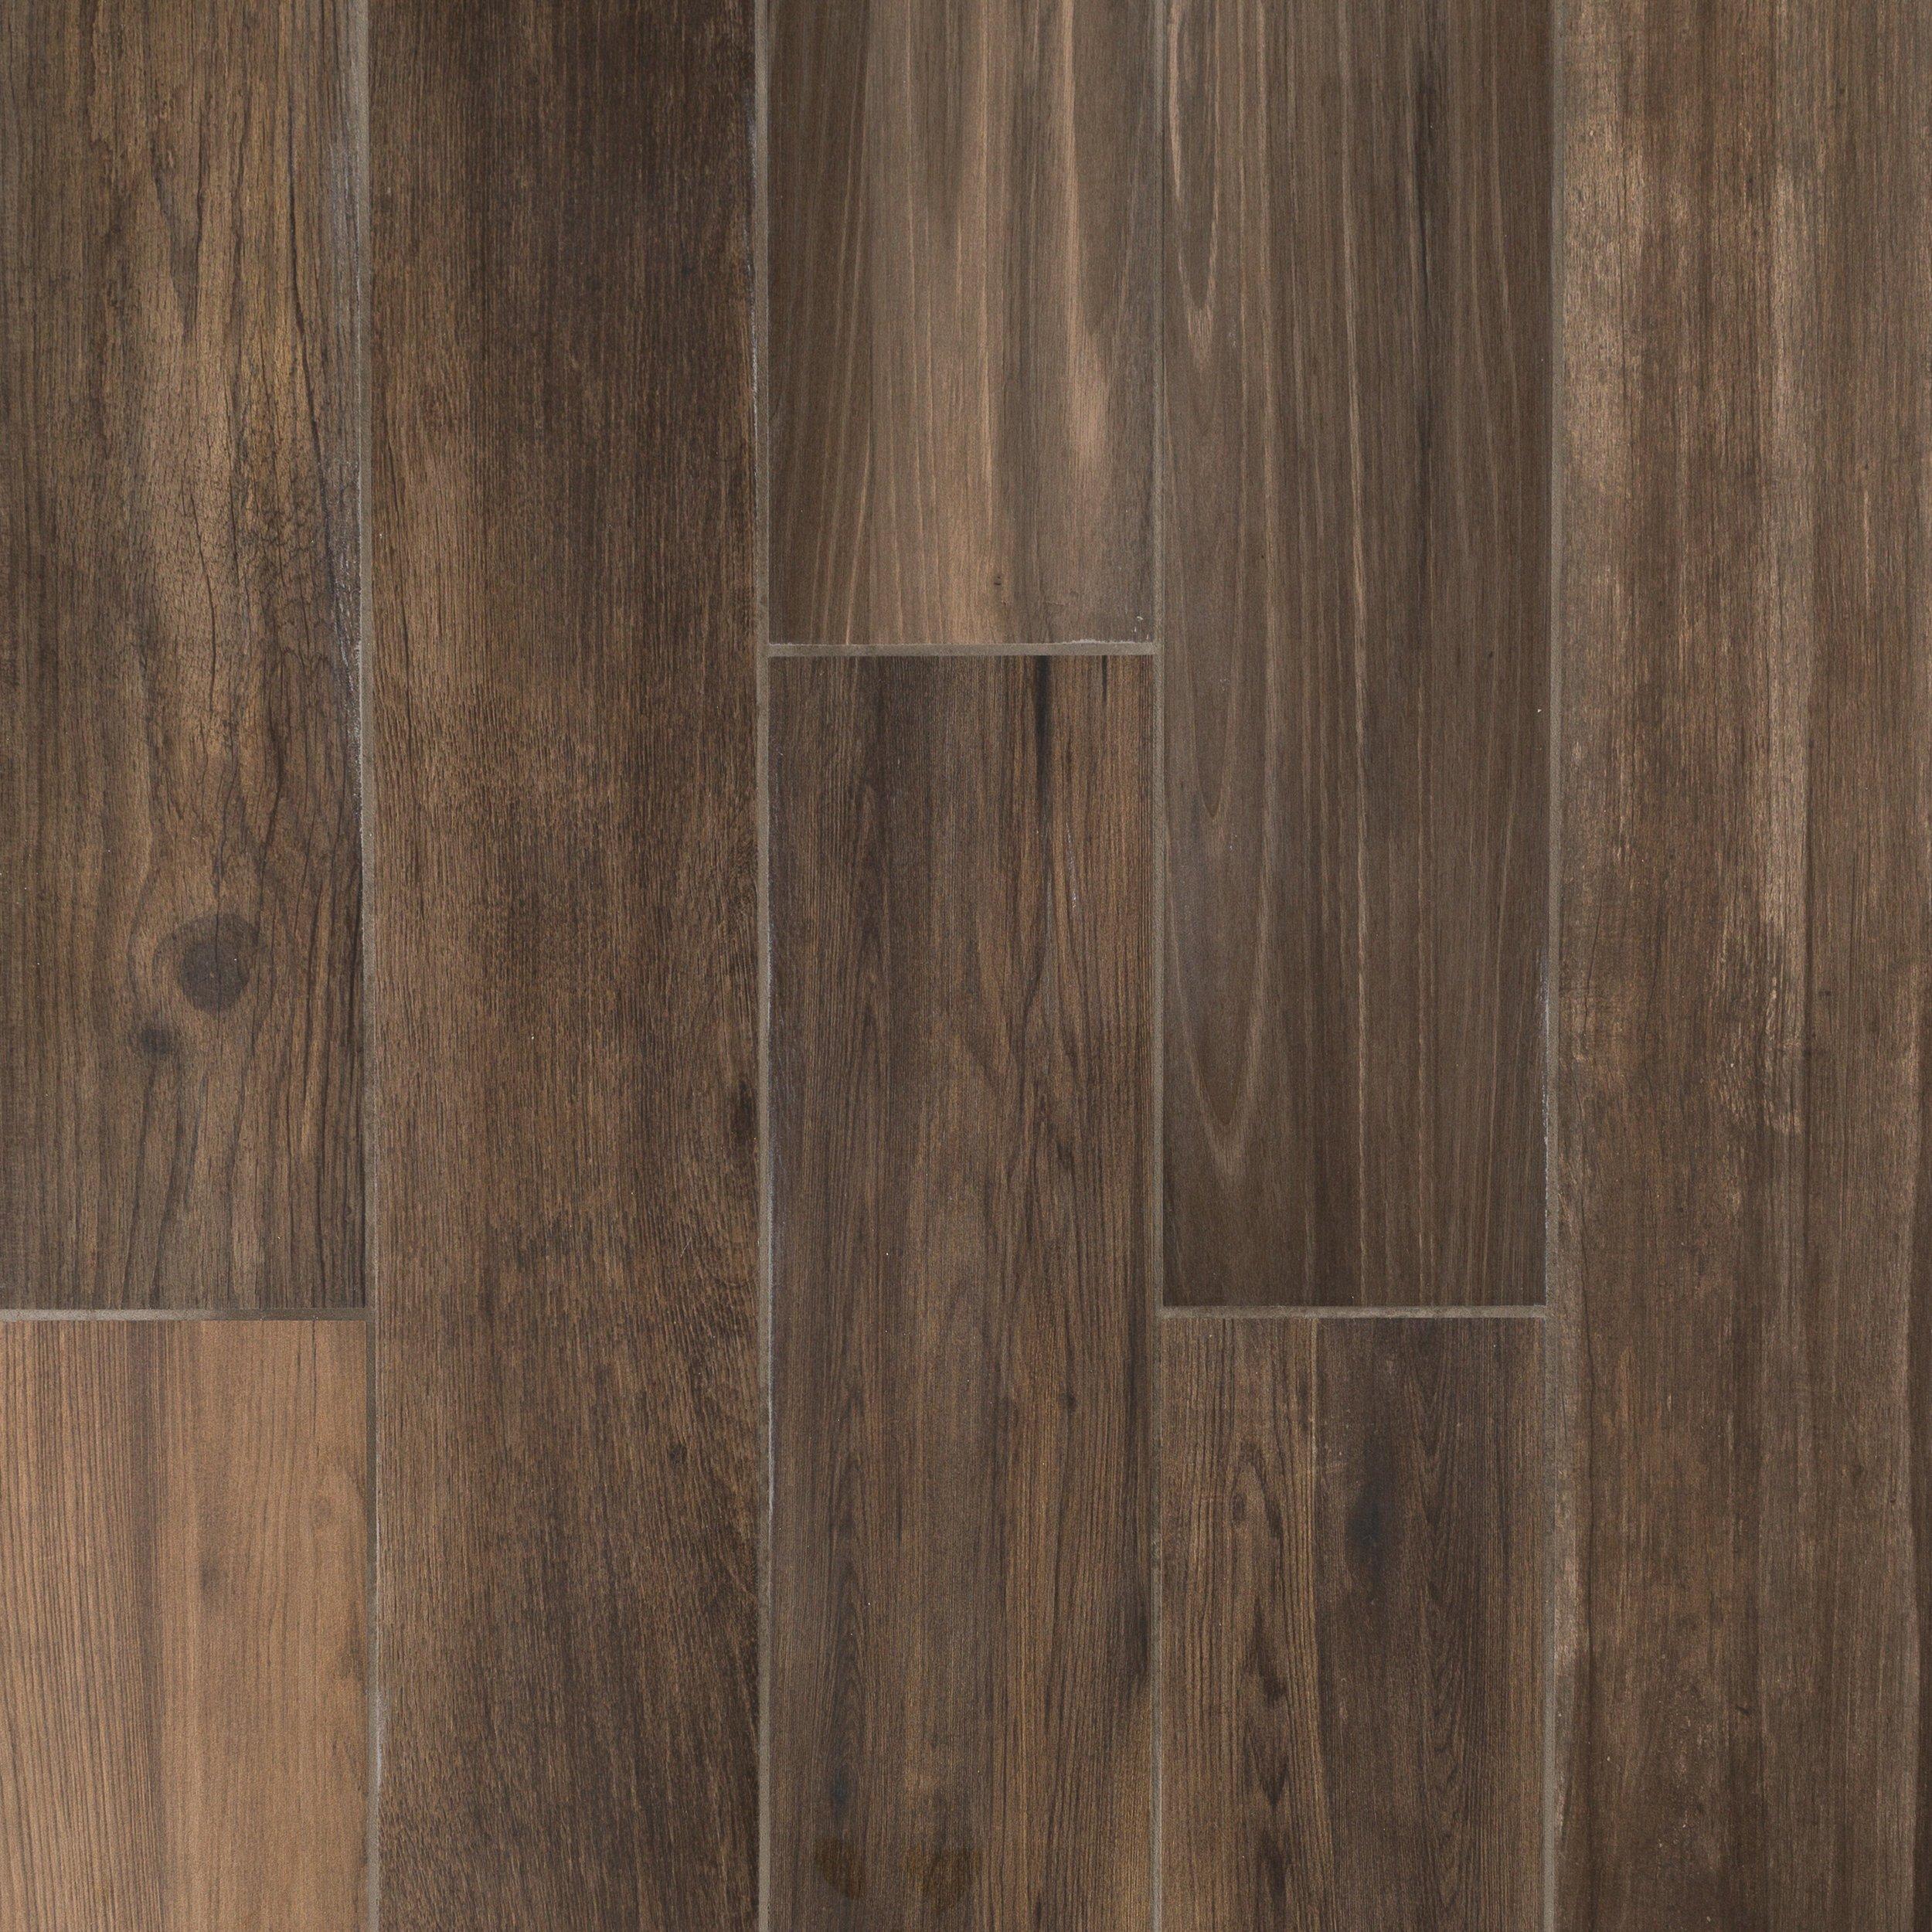 Ridgewood Espresso Wood Plank Porcelain Tile 6 X 36